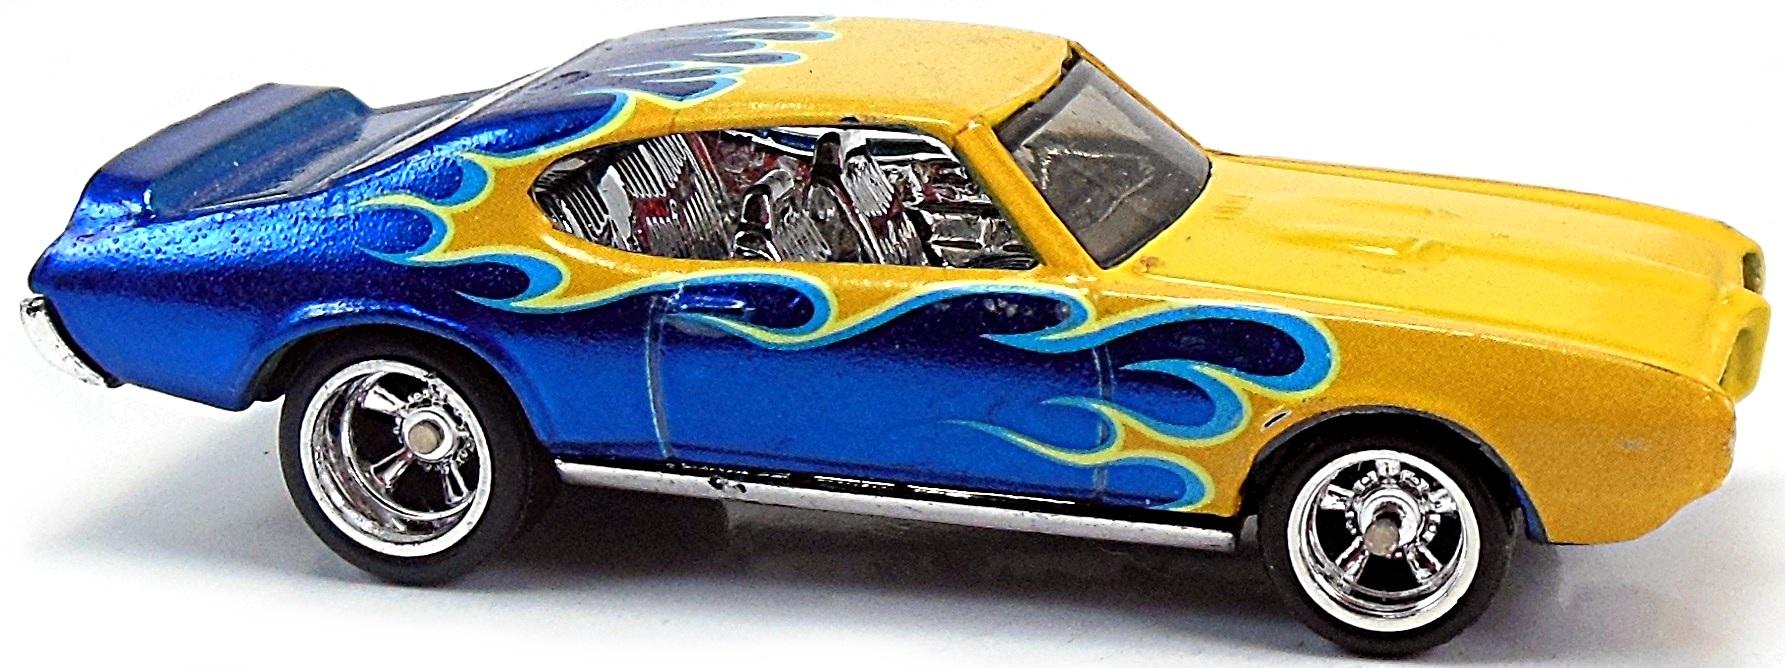 CP07 Hot Wheels Treasure Hunt /'69 Pontiac GTO 2007-121 carte courte